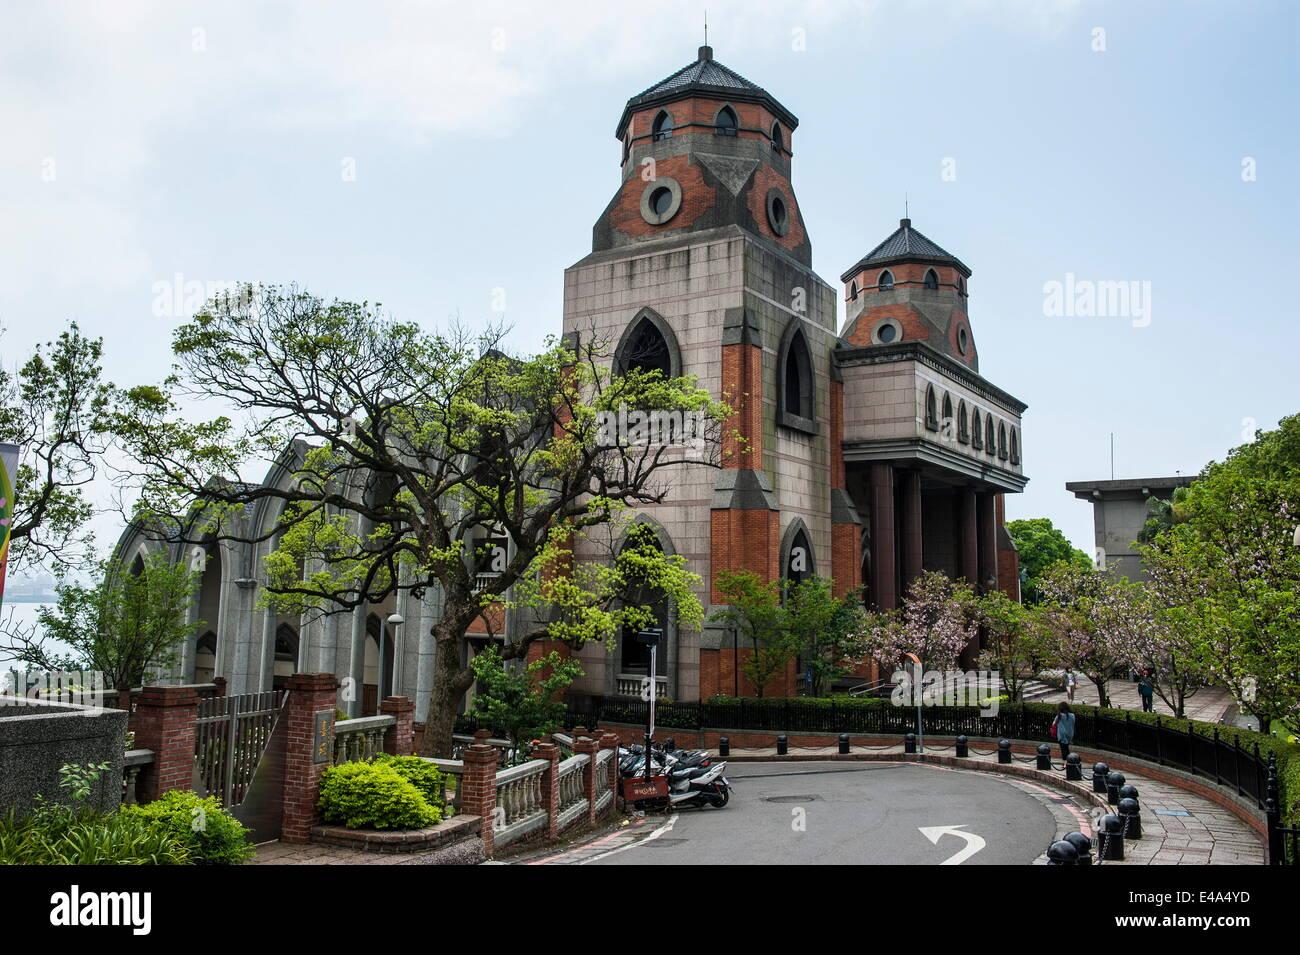 Oxford College in the Alethia University, Danshui, suburb of Taipeh, Taiwan, Asia - Stock Image